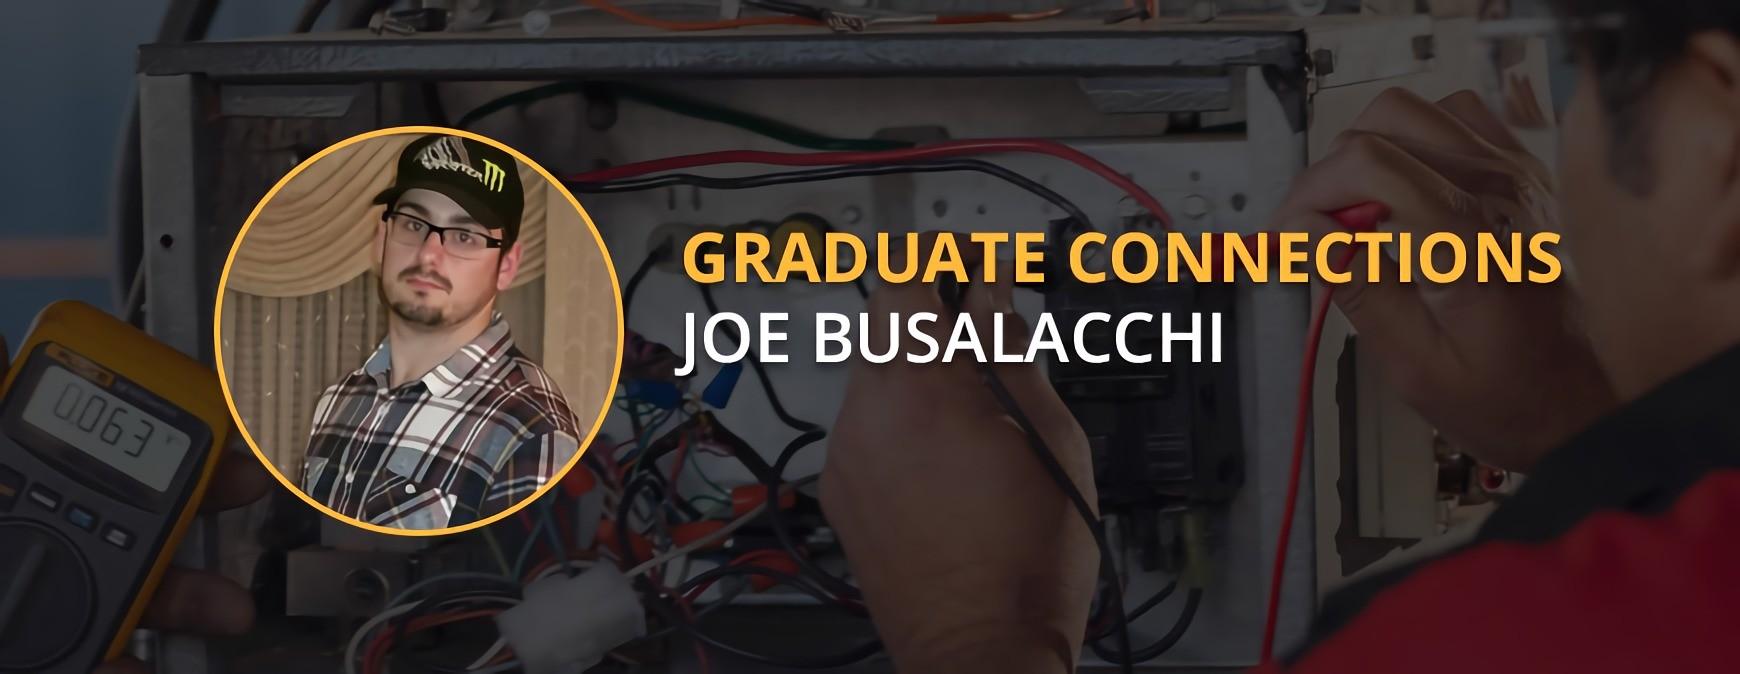 Joe Busalacchi